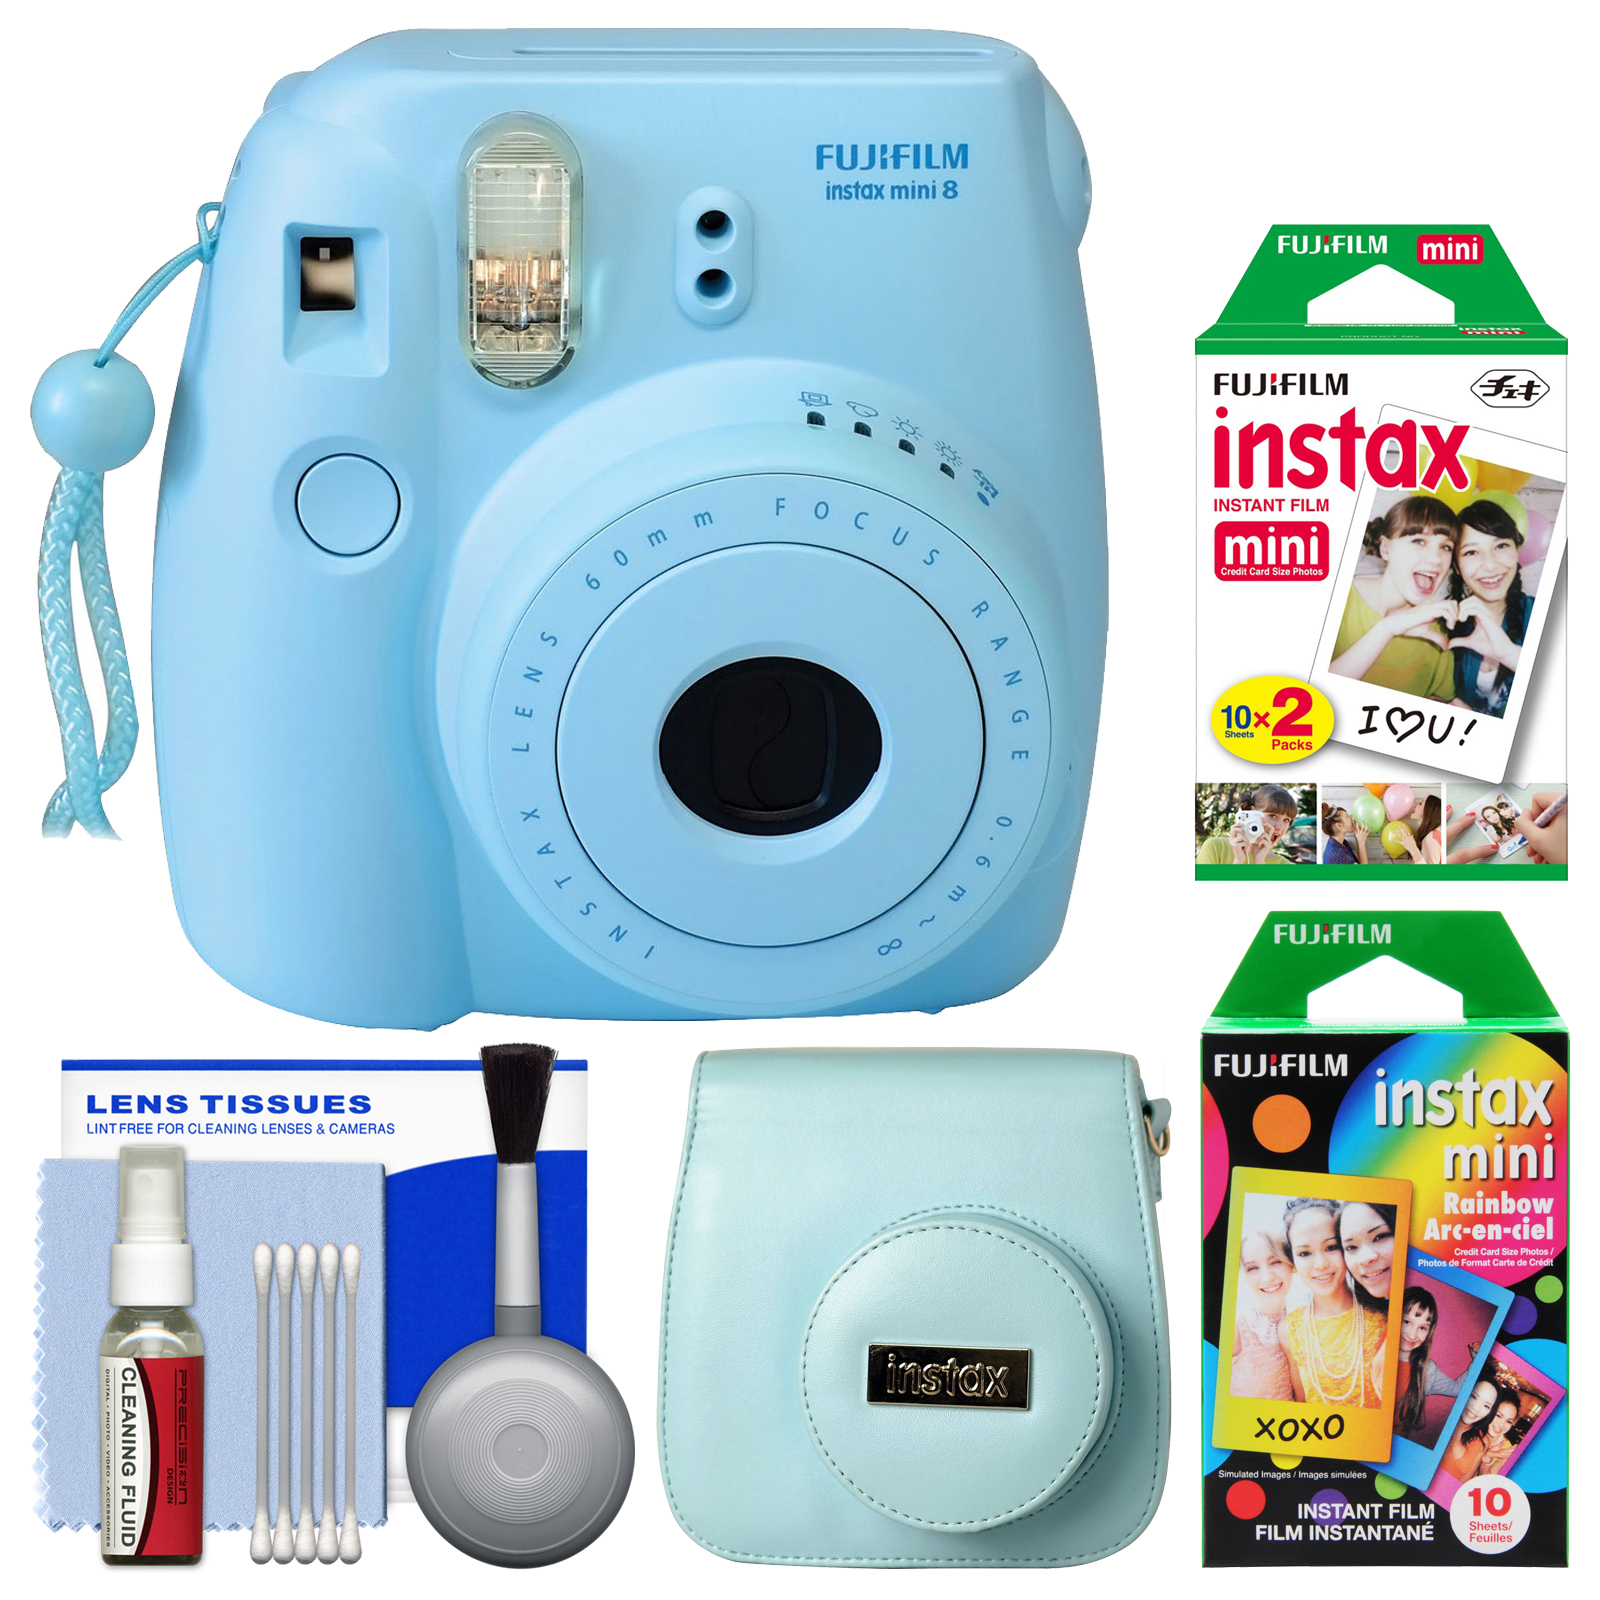 Fujifilm Instax Mini 8 Instant Film Camera (Blue) with 20 Twin & 10 Rainbow Prints + Case + Kit